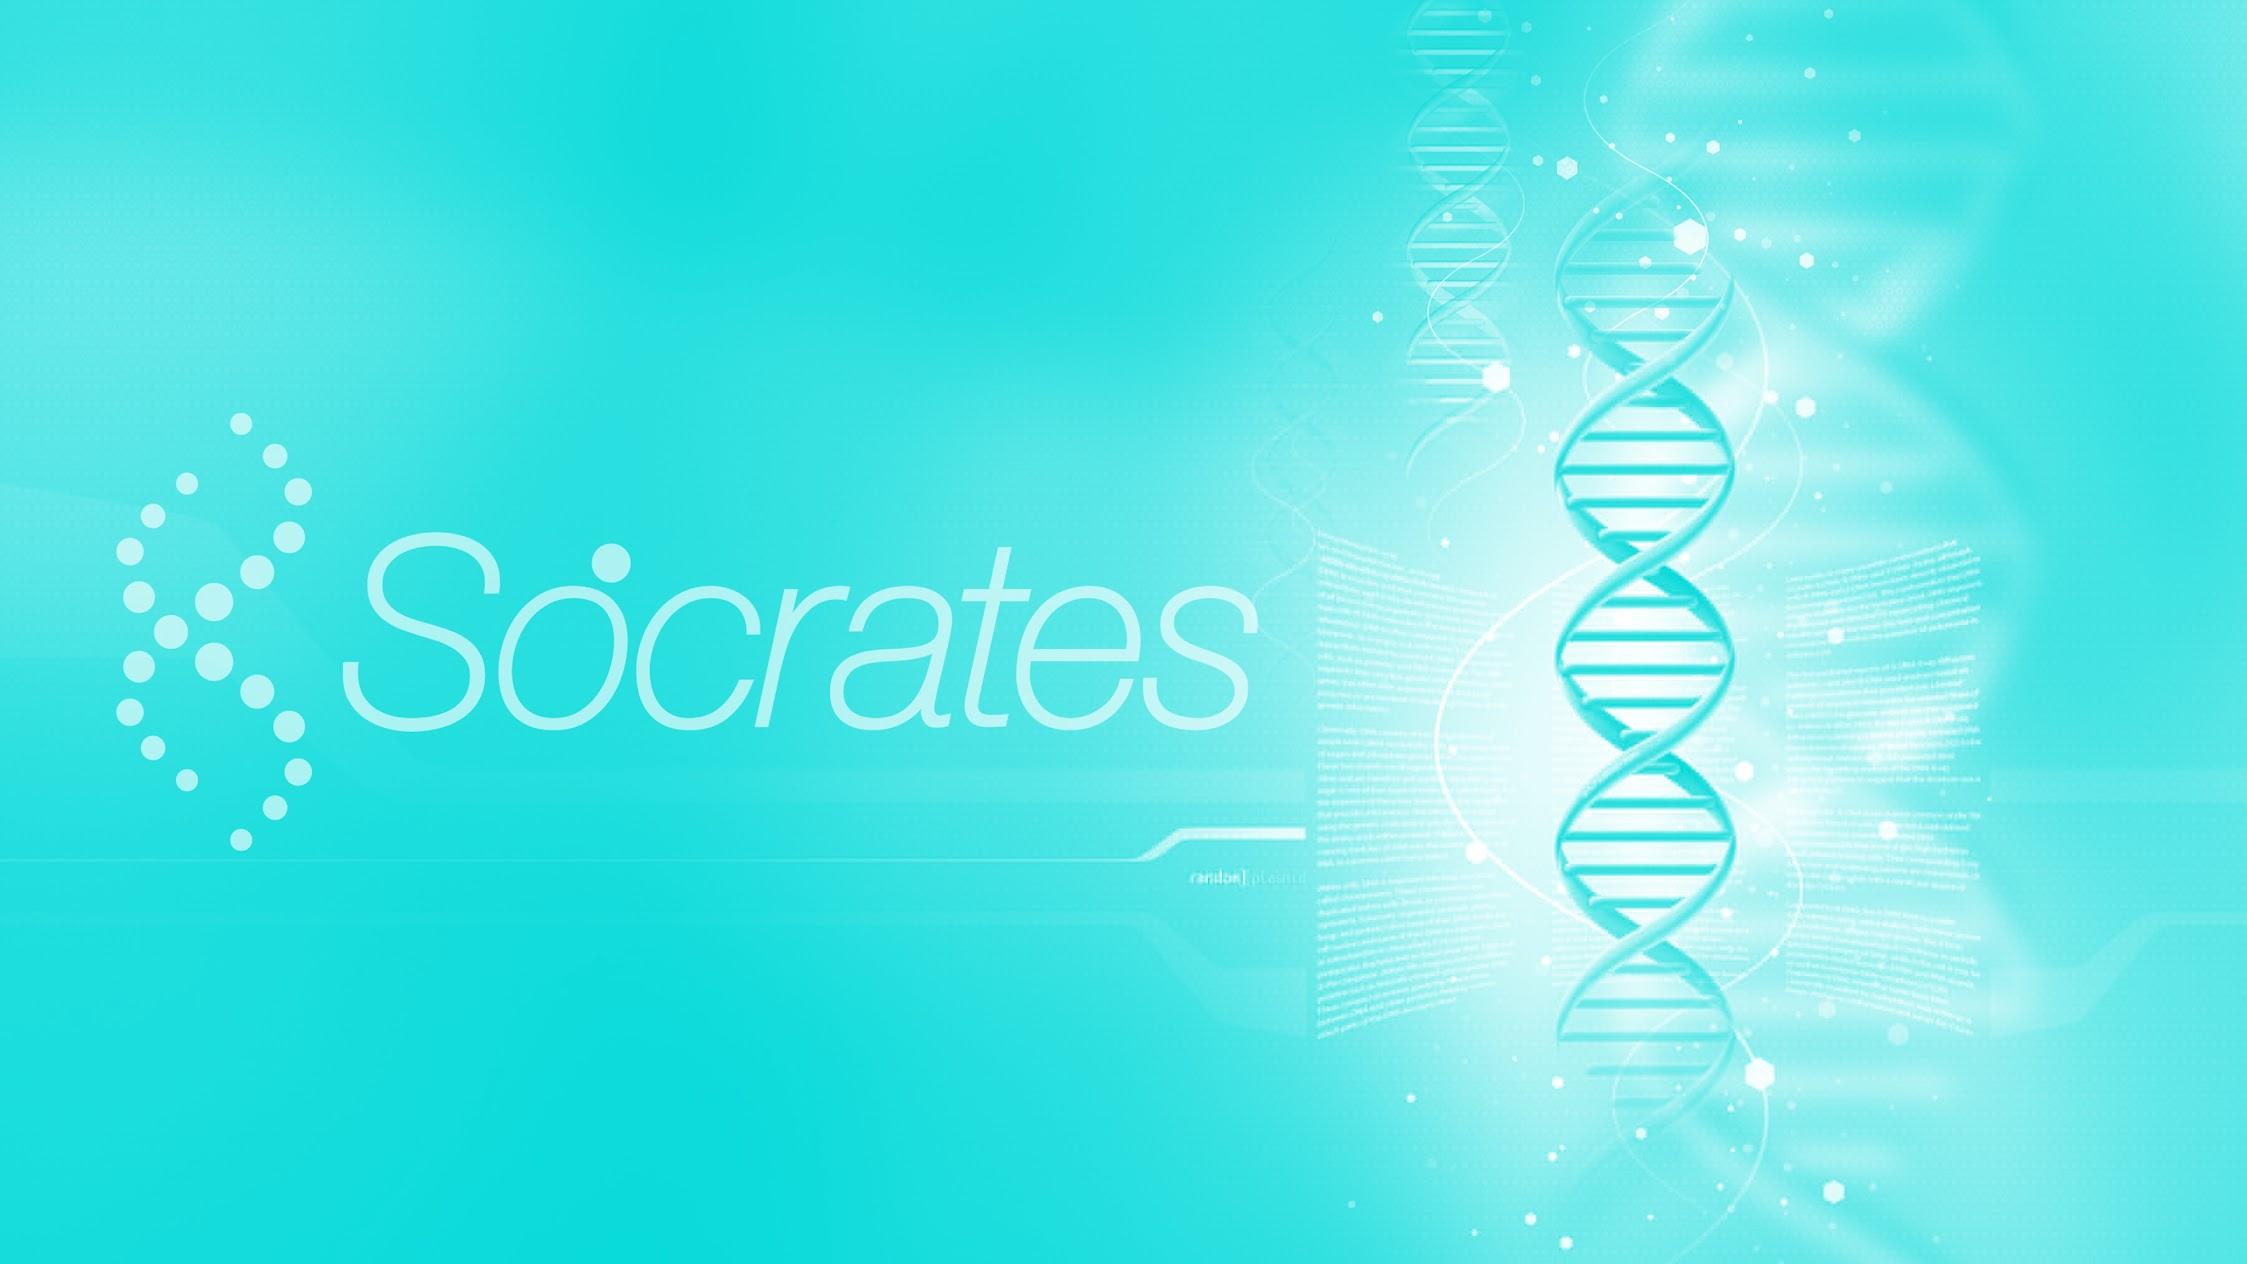 Socrates.cl